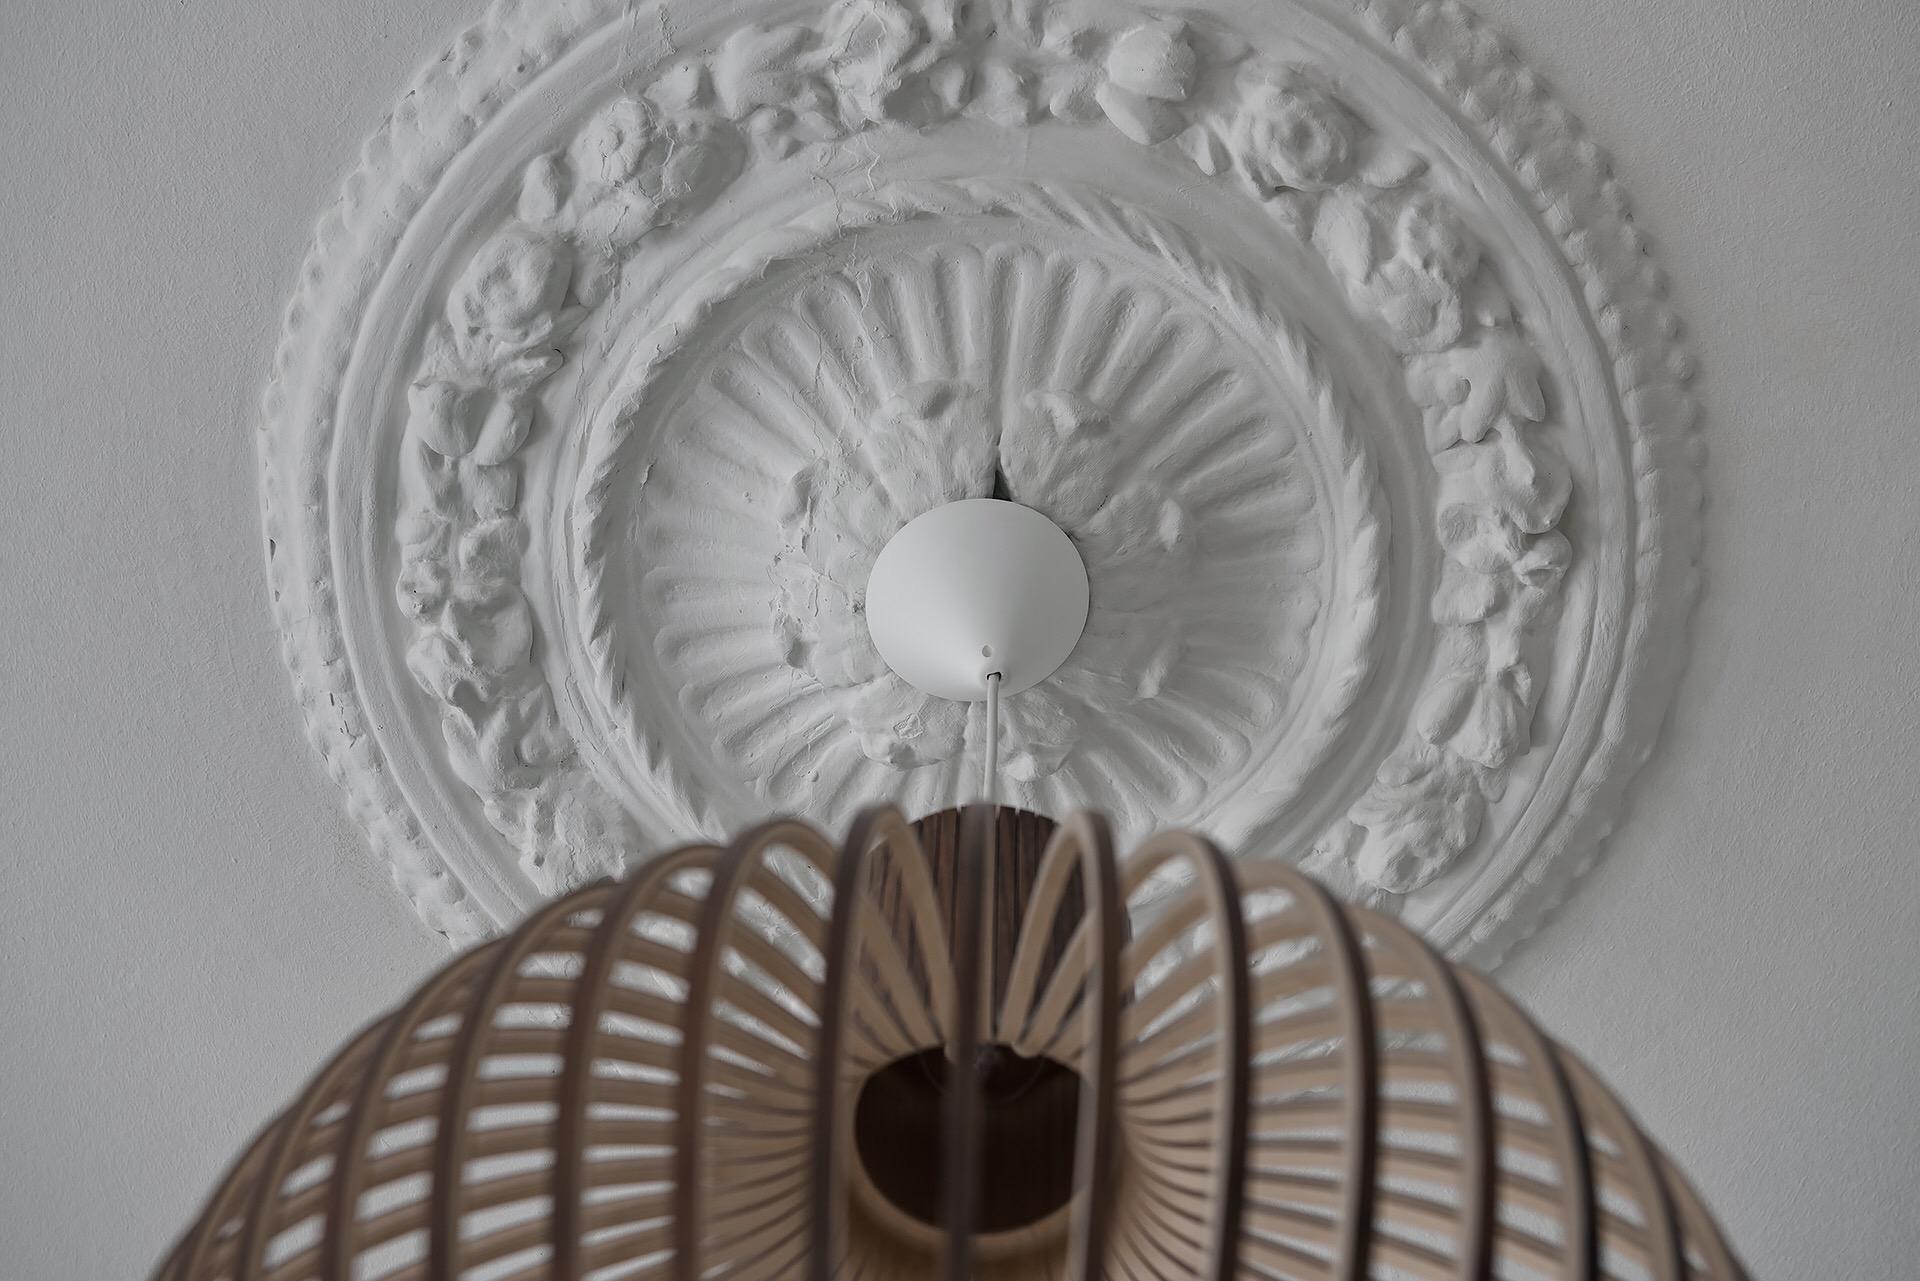 потолок лепнина розетка люстра